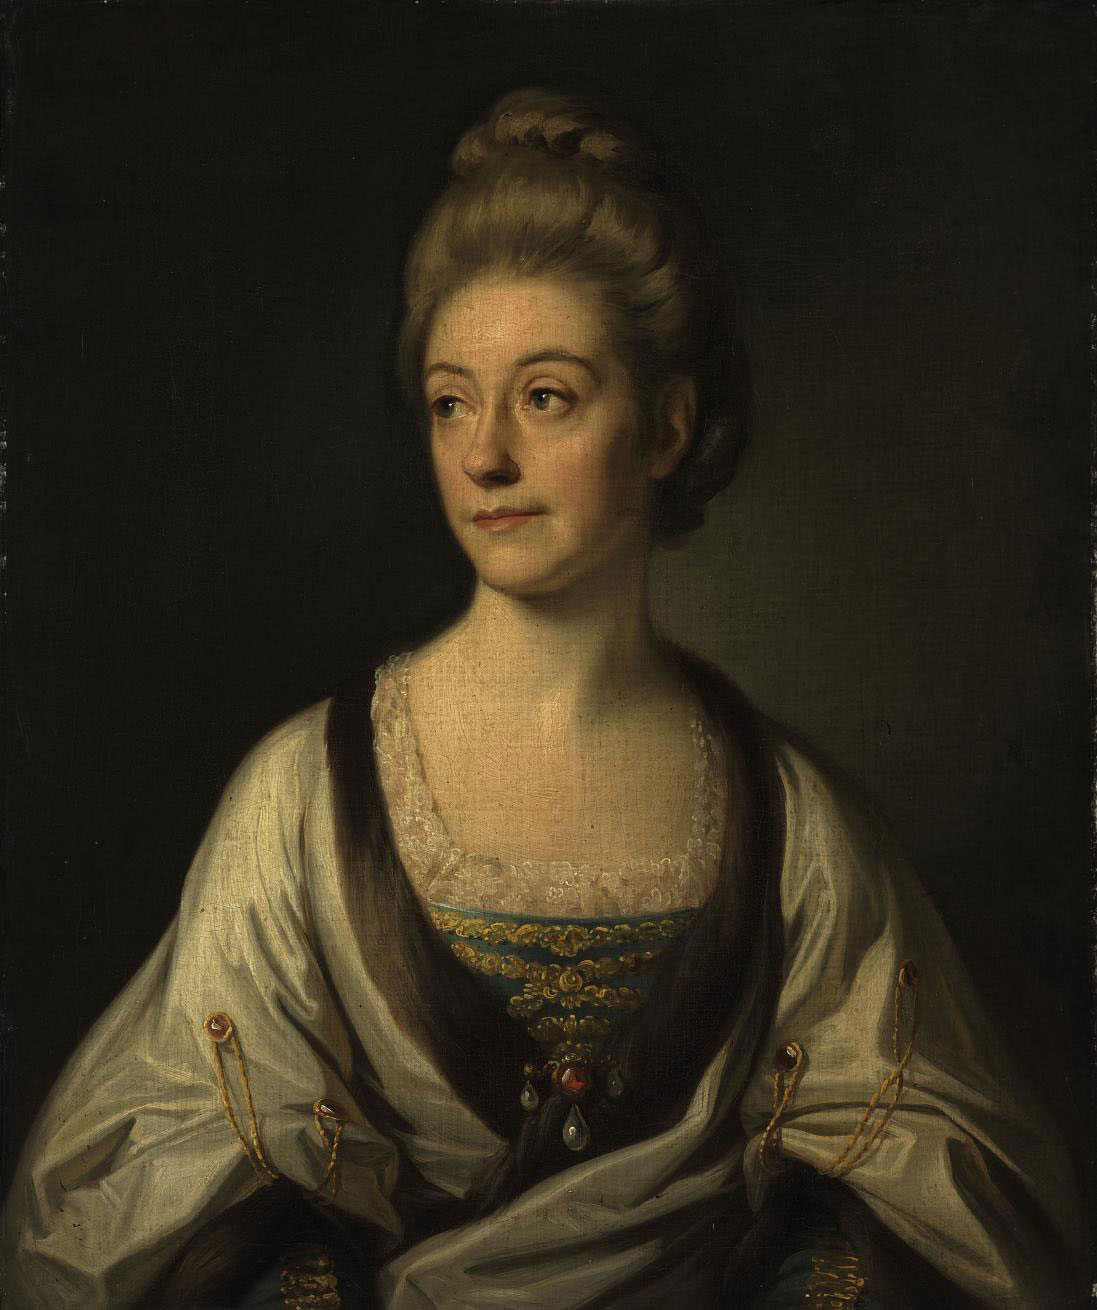 Portrait of the Duchess of Sutherland, half-length